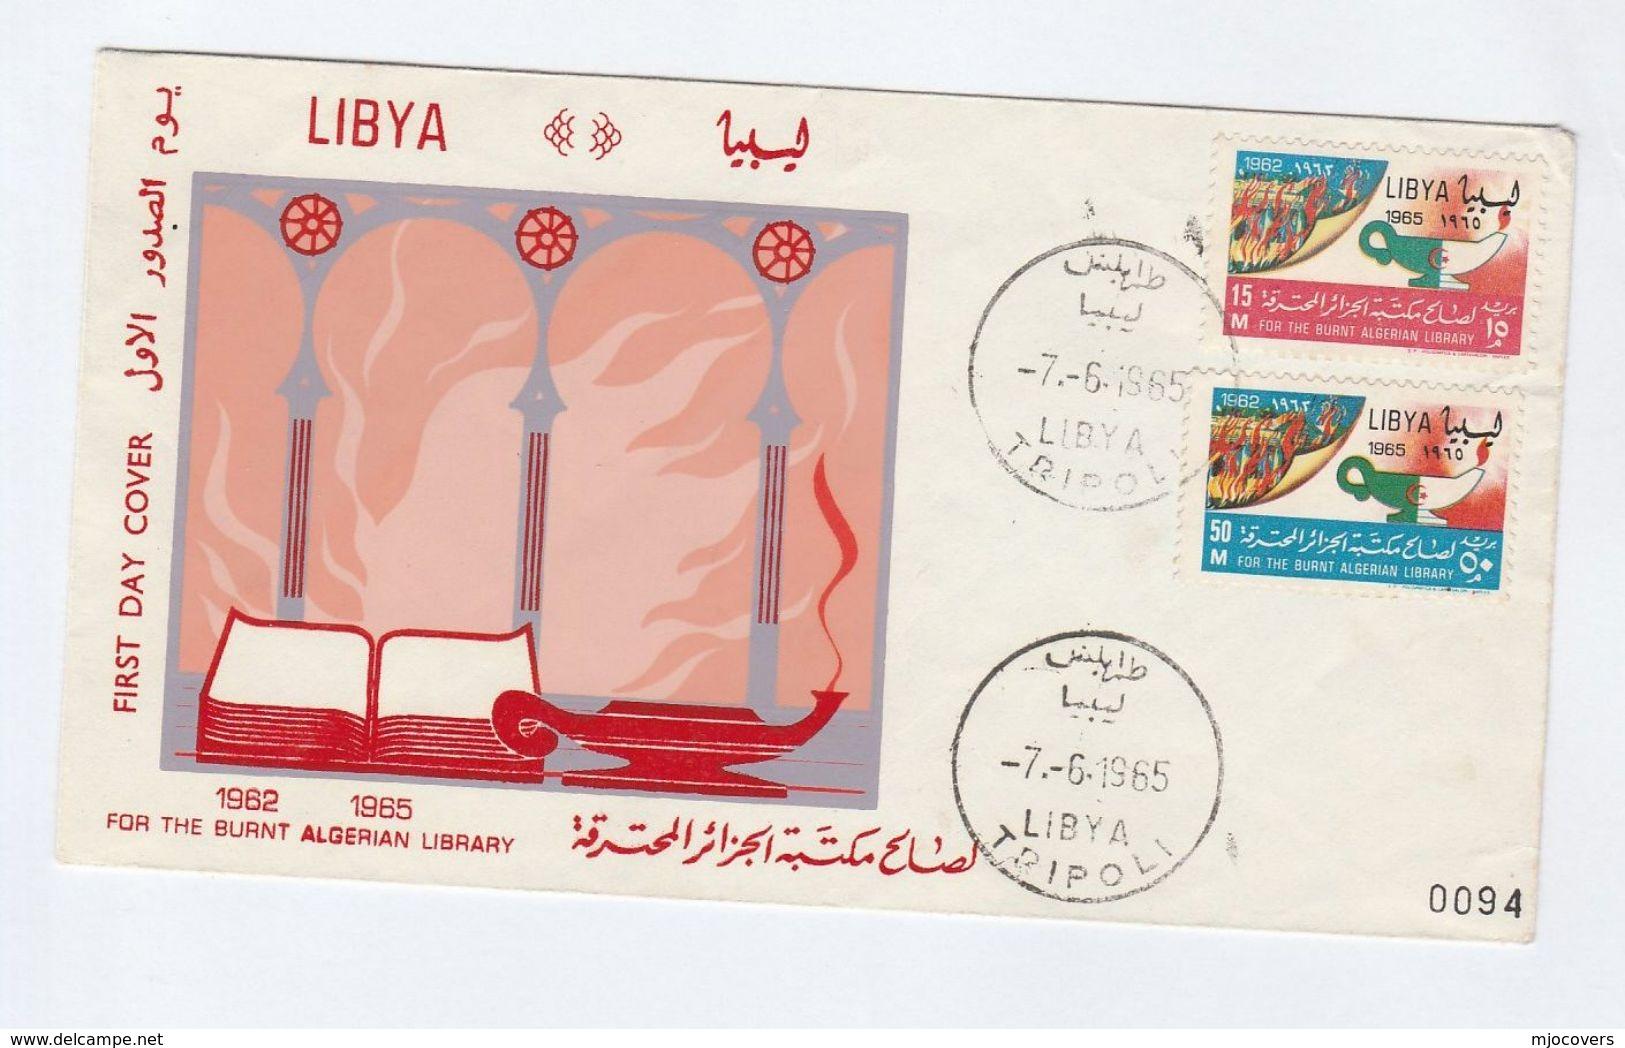 1965 LIBYA FDC Stamps BURNING ALGERIAN LIBRARY , BOOK, OIL LAMP Cover - Libya